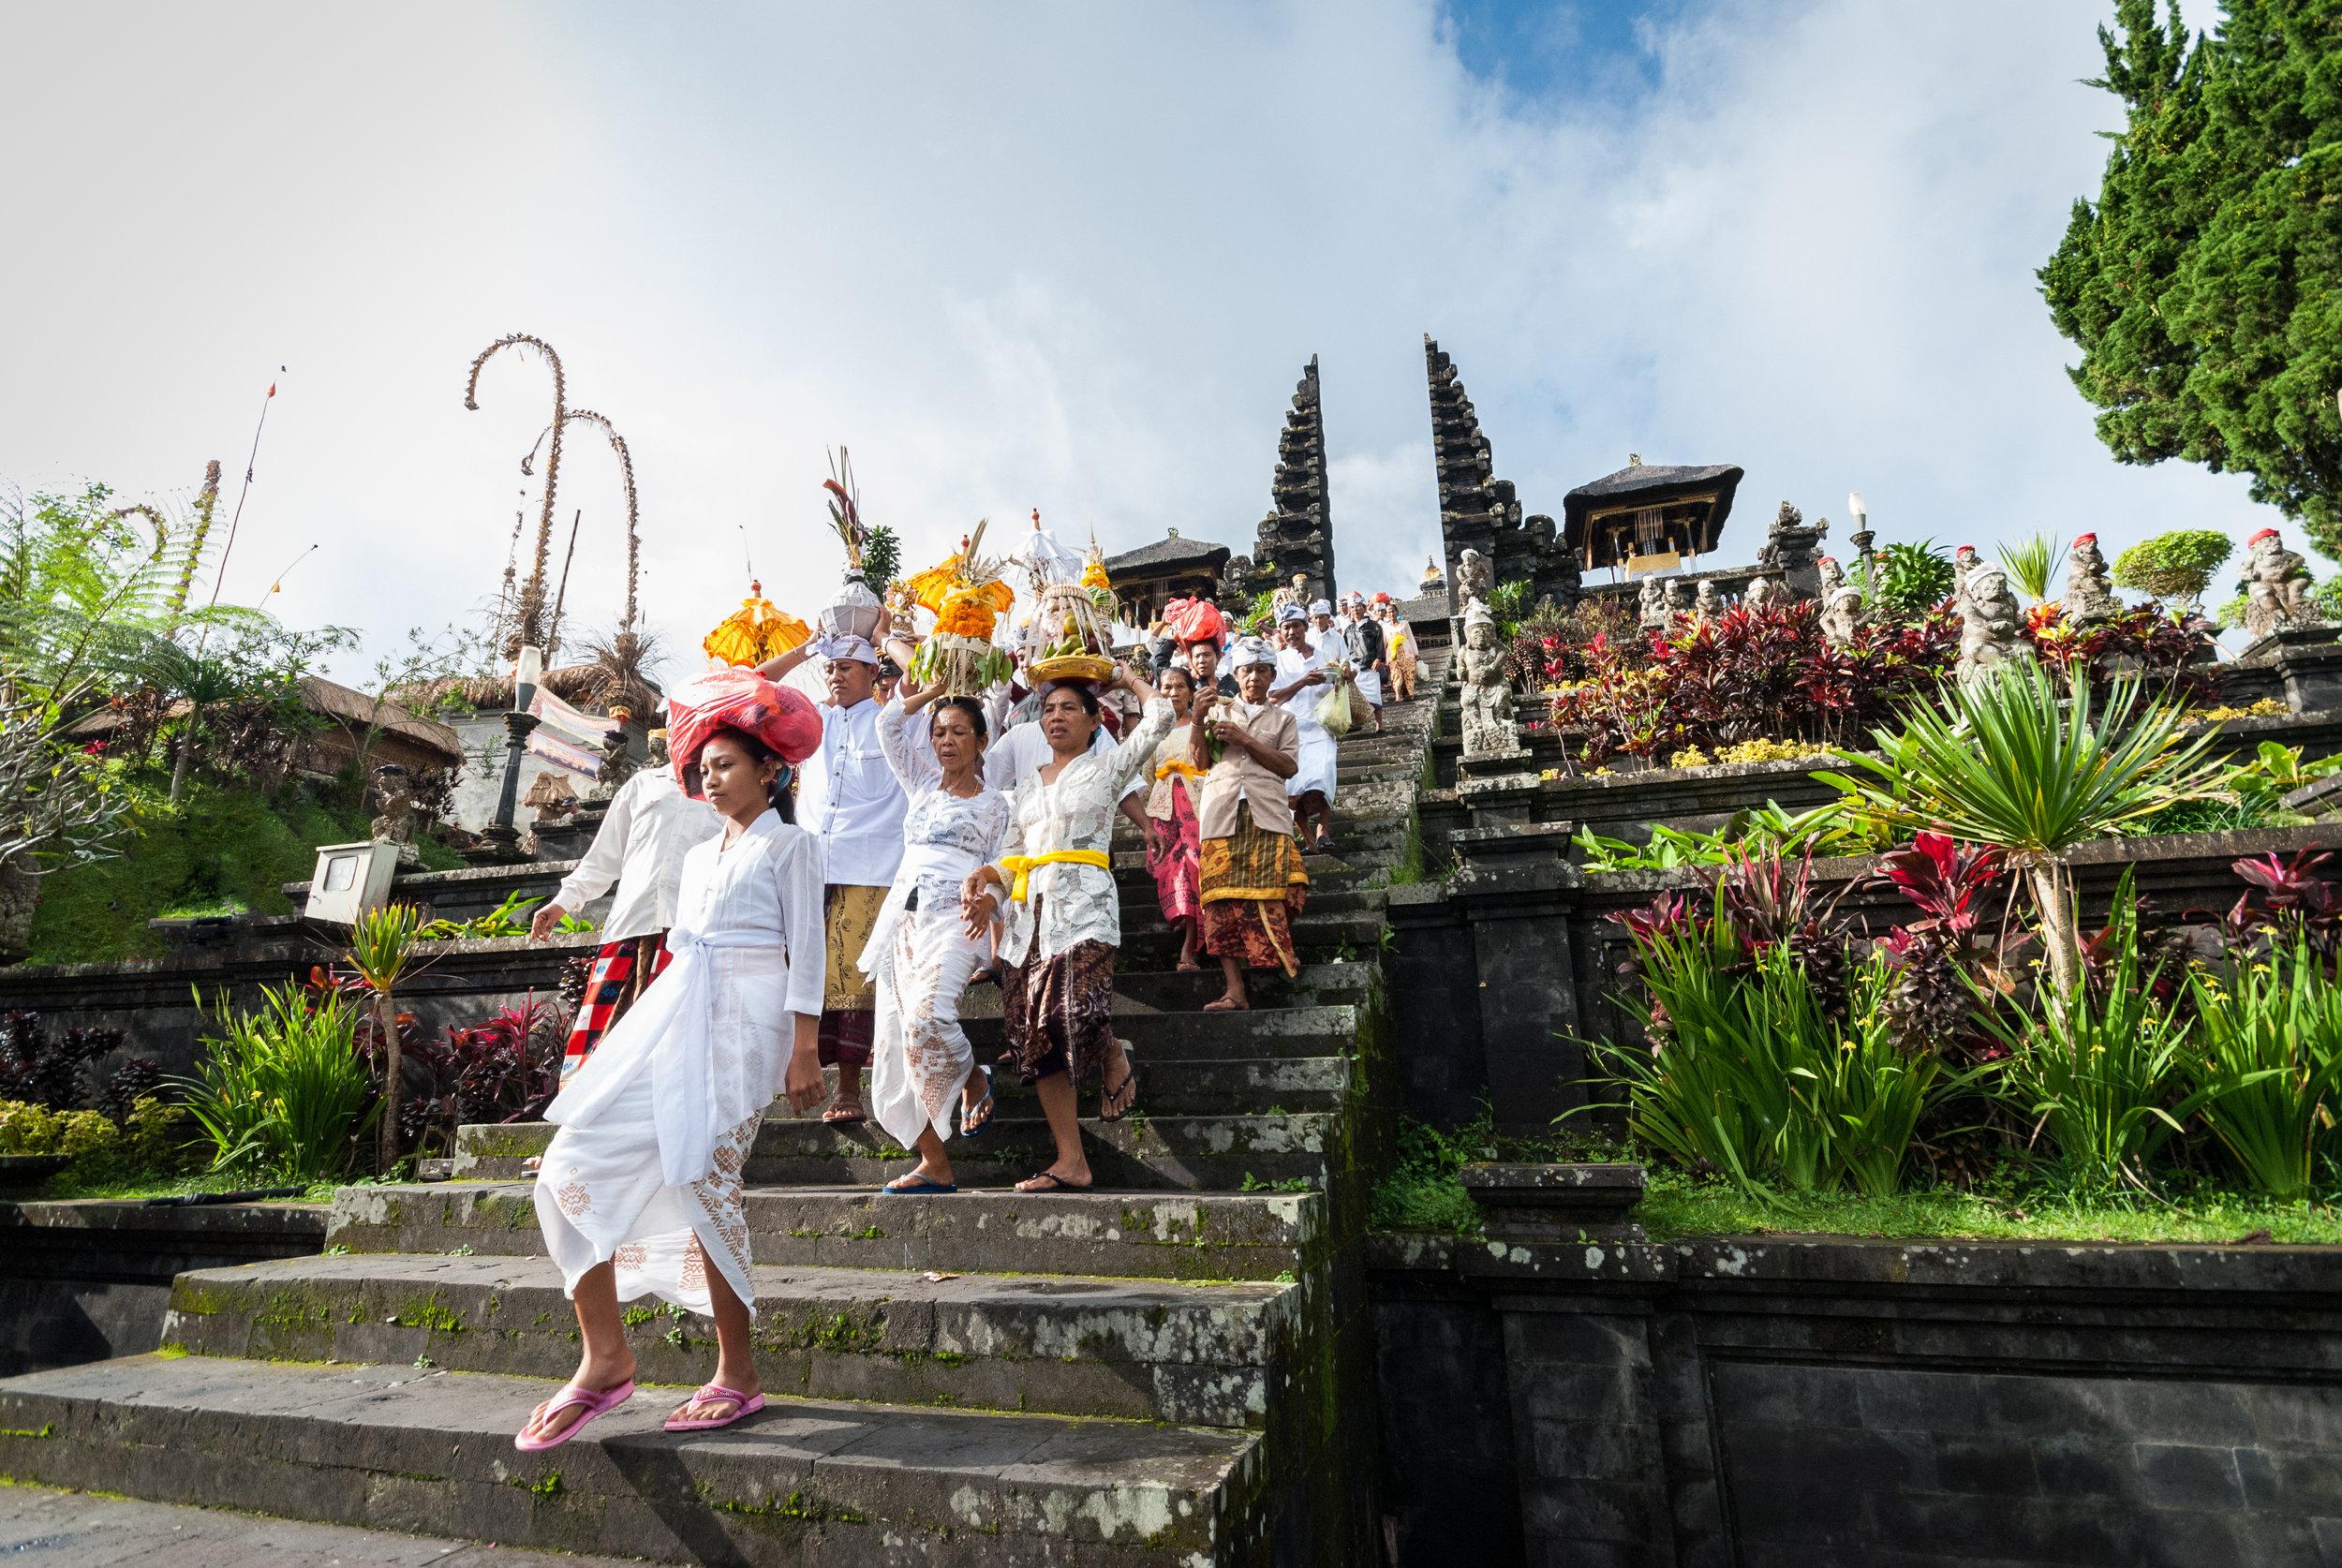 Traditional Indonesia, Ubud, Indonesia